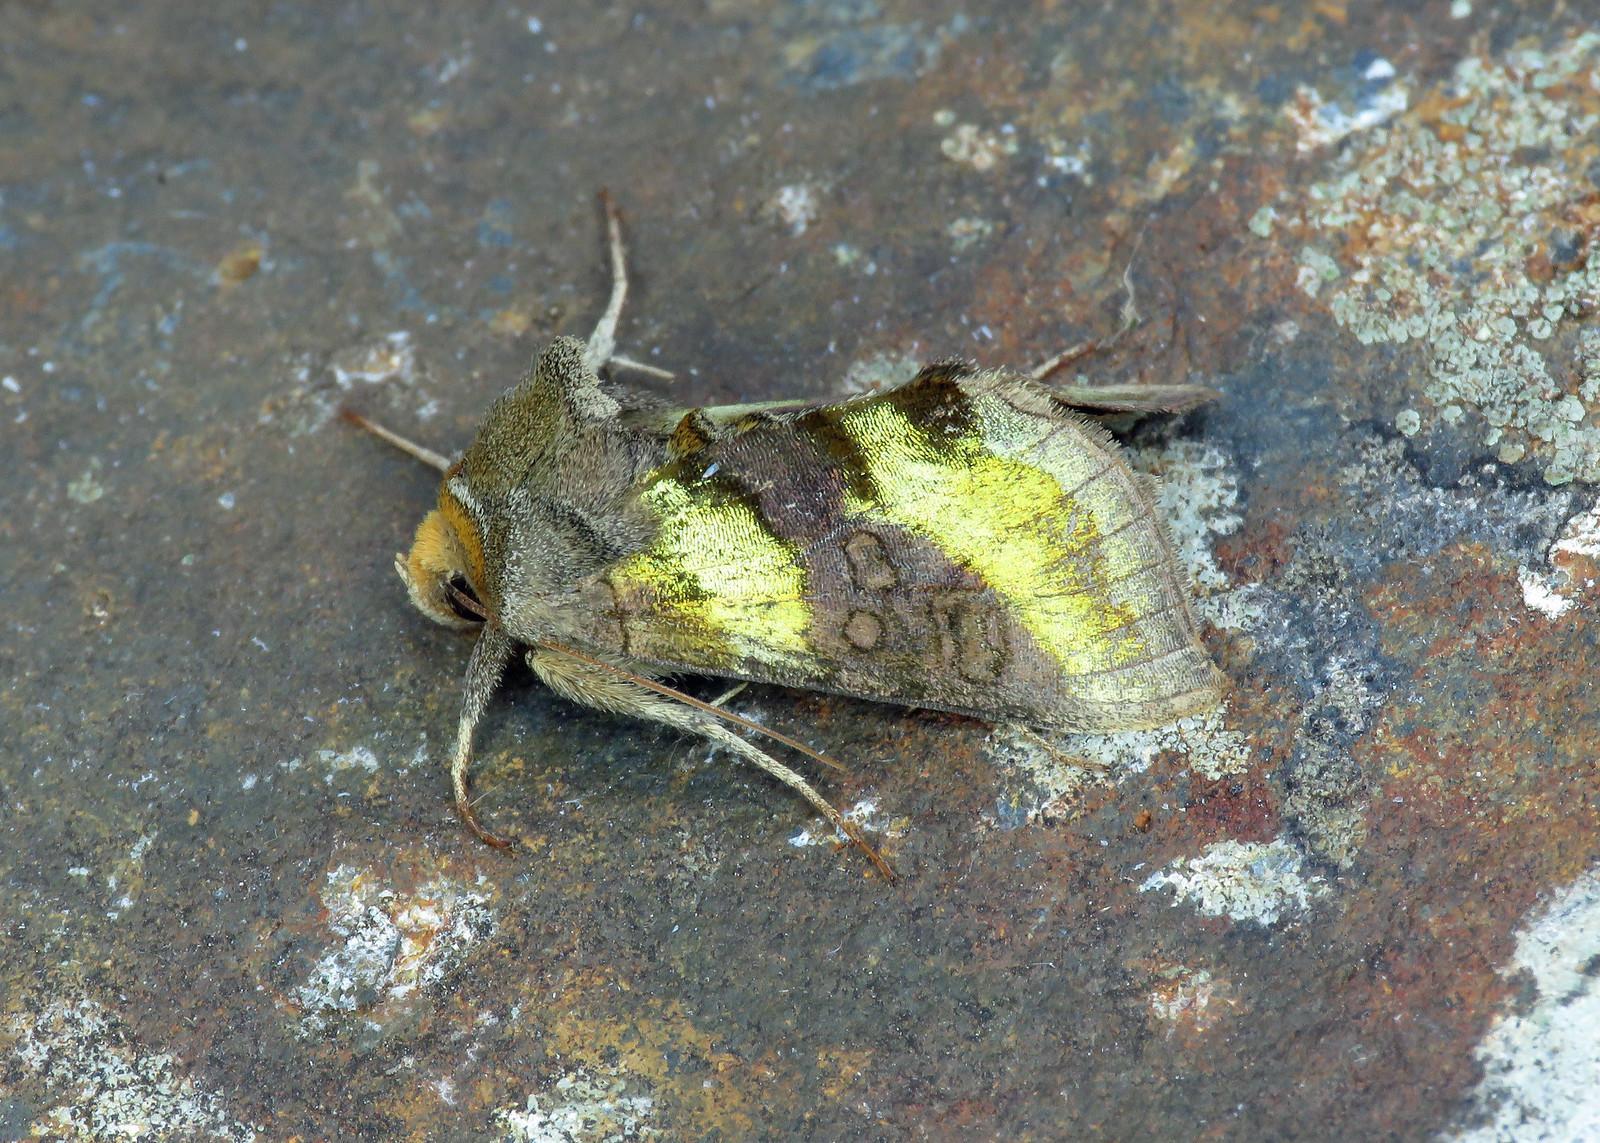 73.012 Burnished Brass - Diachrysia chrysitis